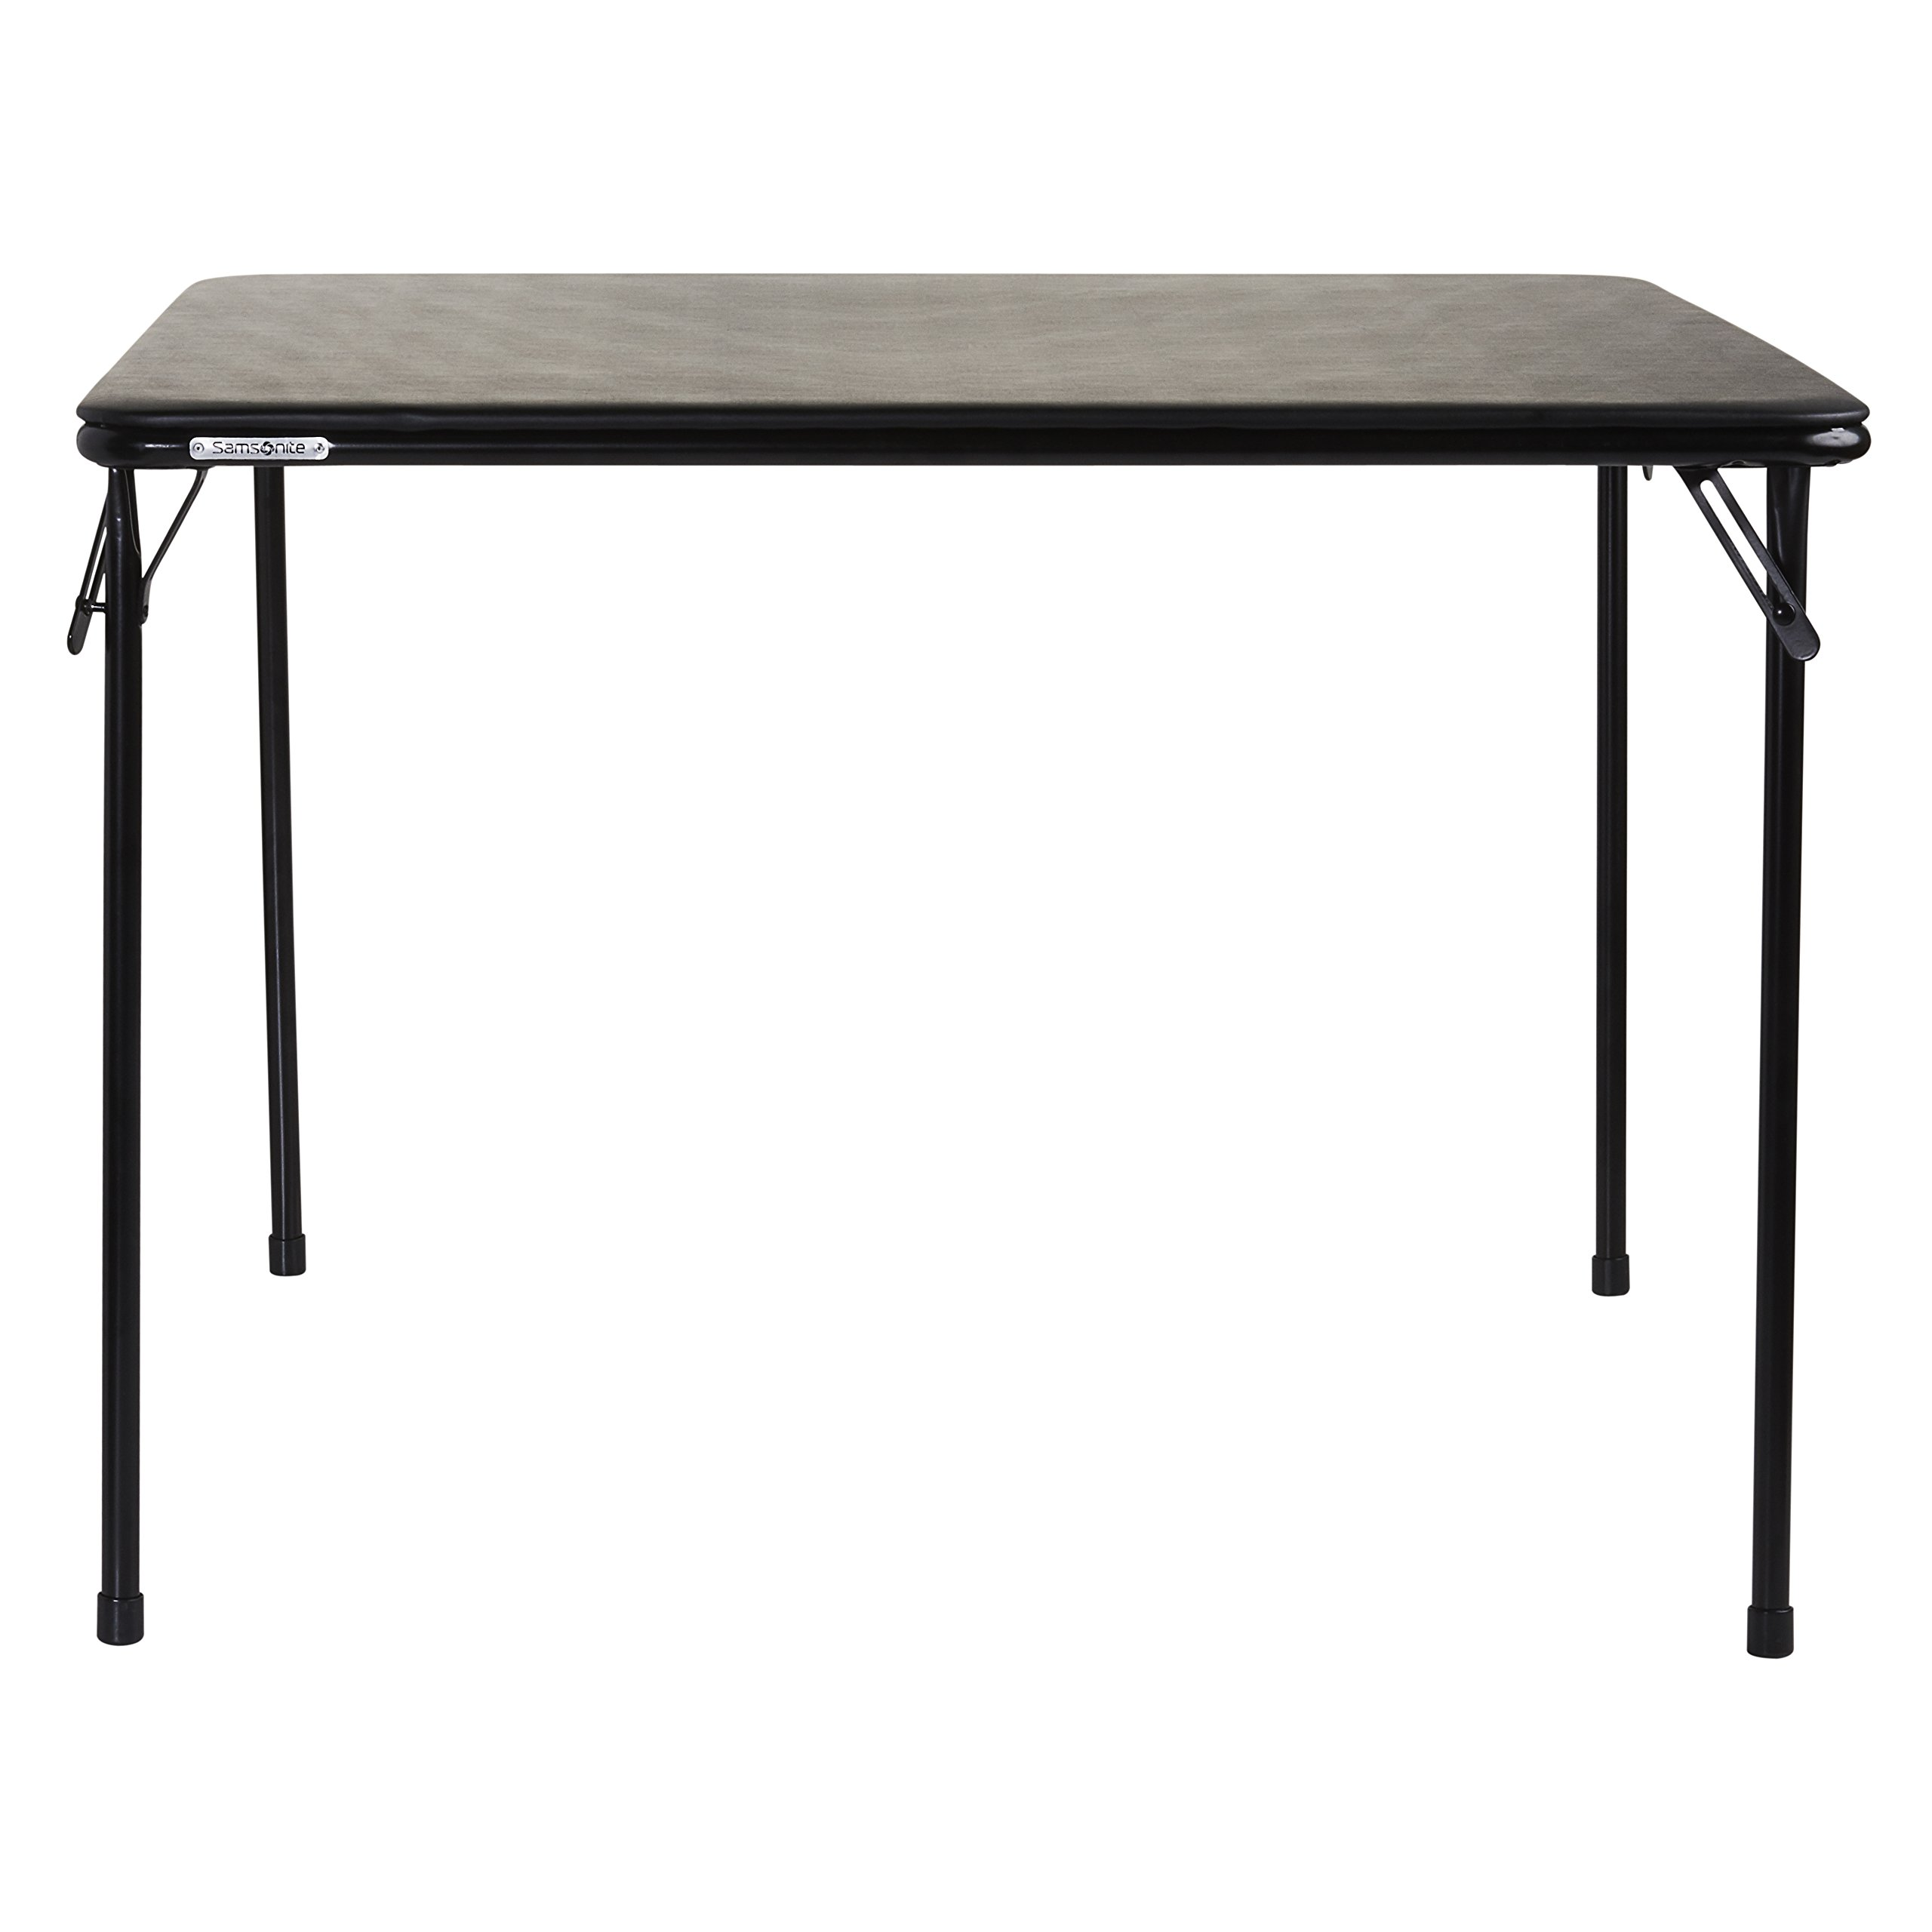 Samsonite 748661041 Card Table, 39'' x 39'', Black by Samsonite